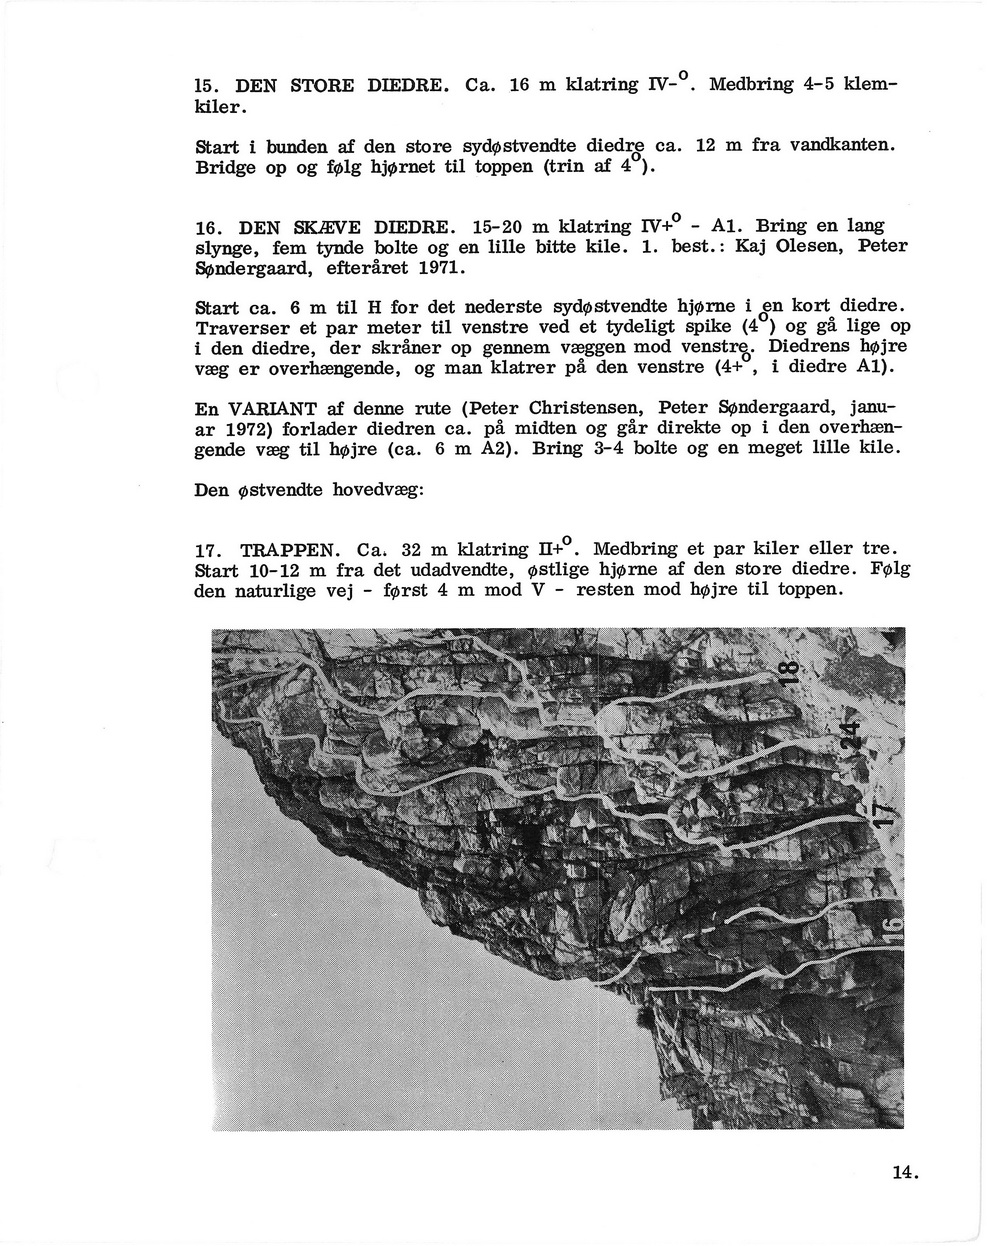 Kullen guide 1972 014.jpg